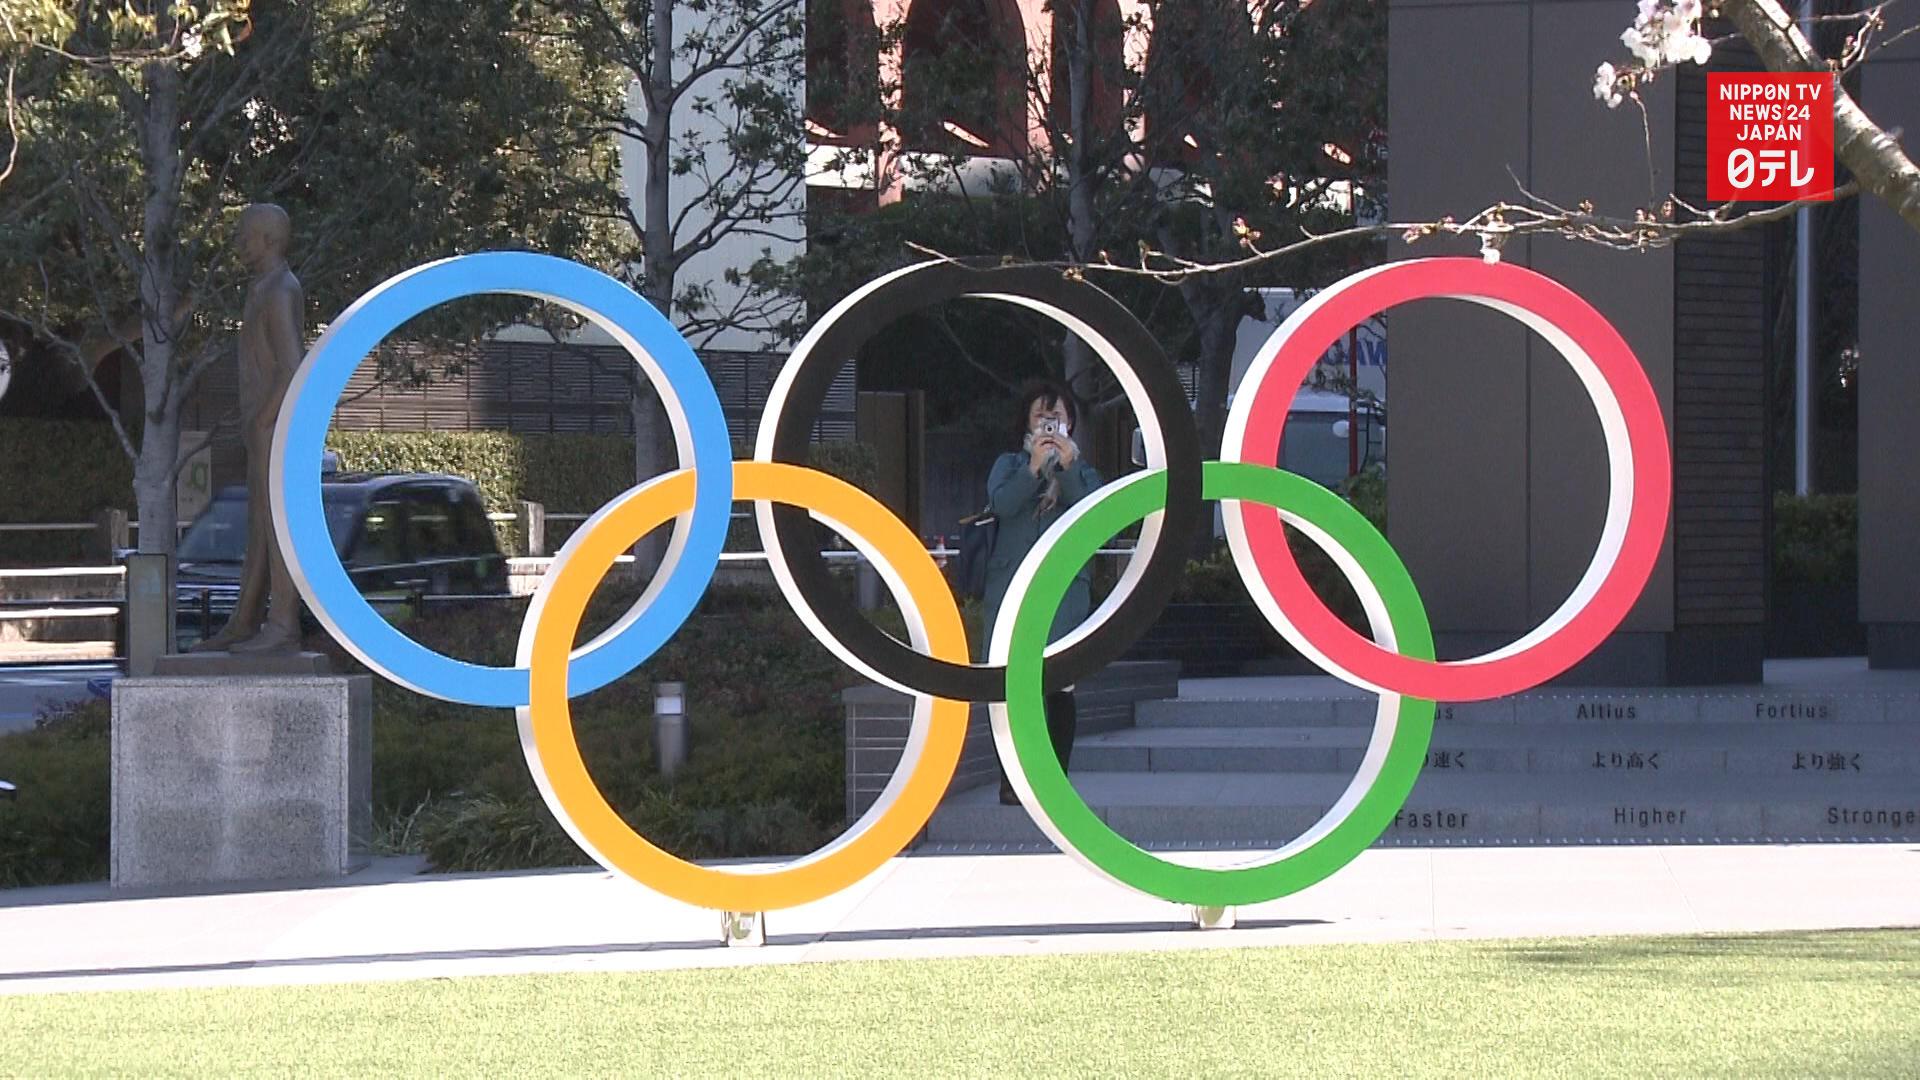 Tokyo Olympics will start July 23, 2021